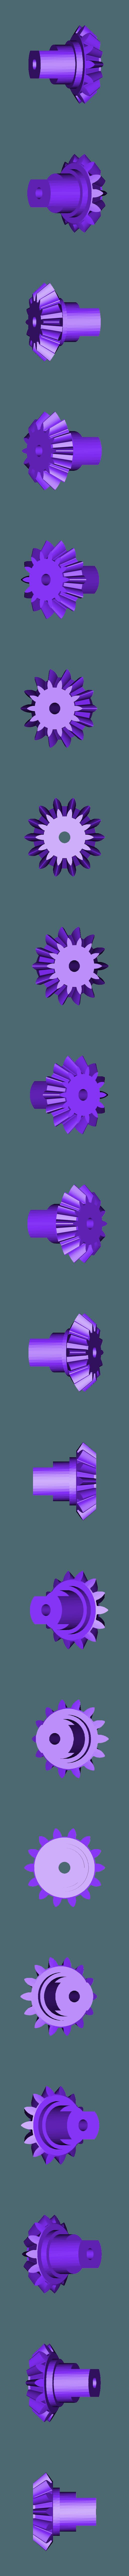 Truck_V4_Axle_Diff_Gear2.STL Download STL file 3D Printed Rc Truck V4 • 3D printable template, MrCrankyface